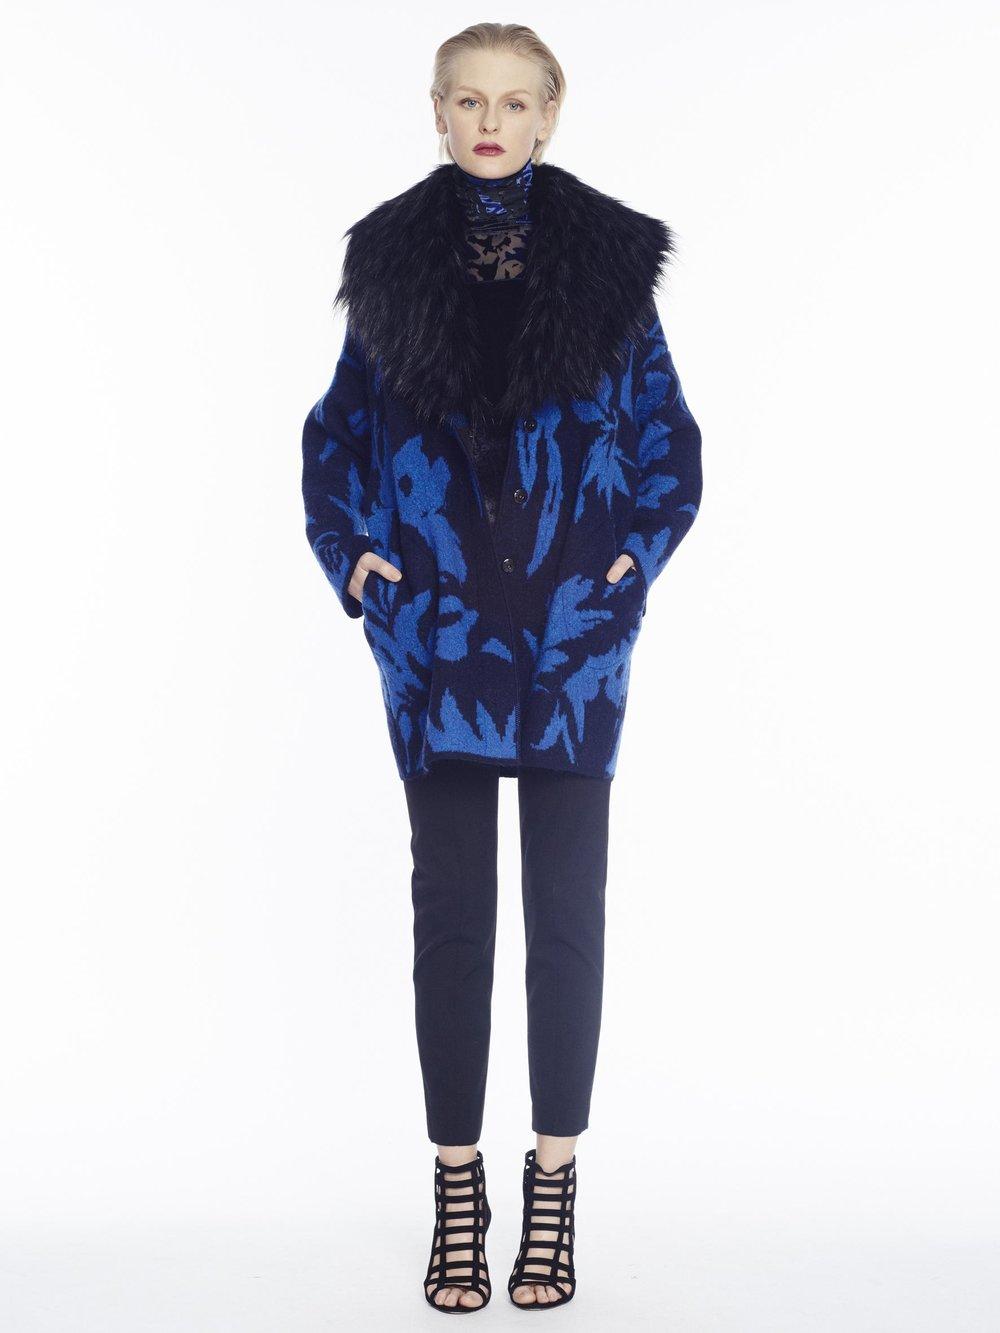 F71503 cappotto - F71630 t-shirt c/alto m/l - F71749 pantalone